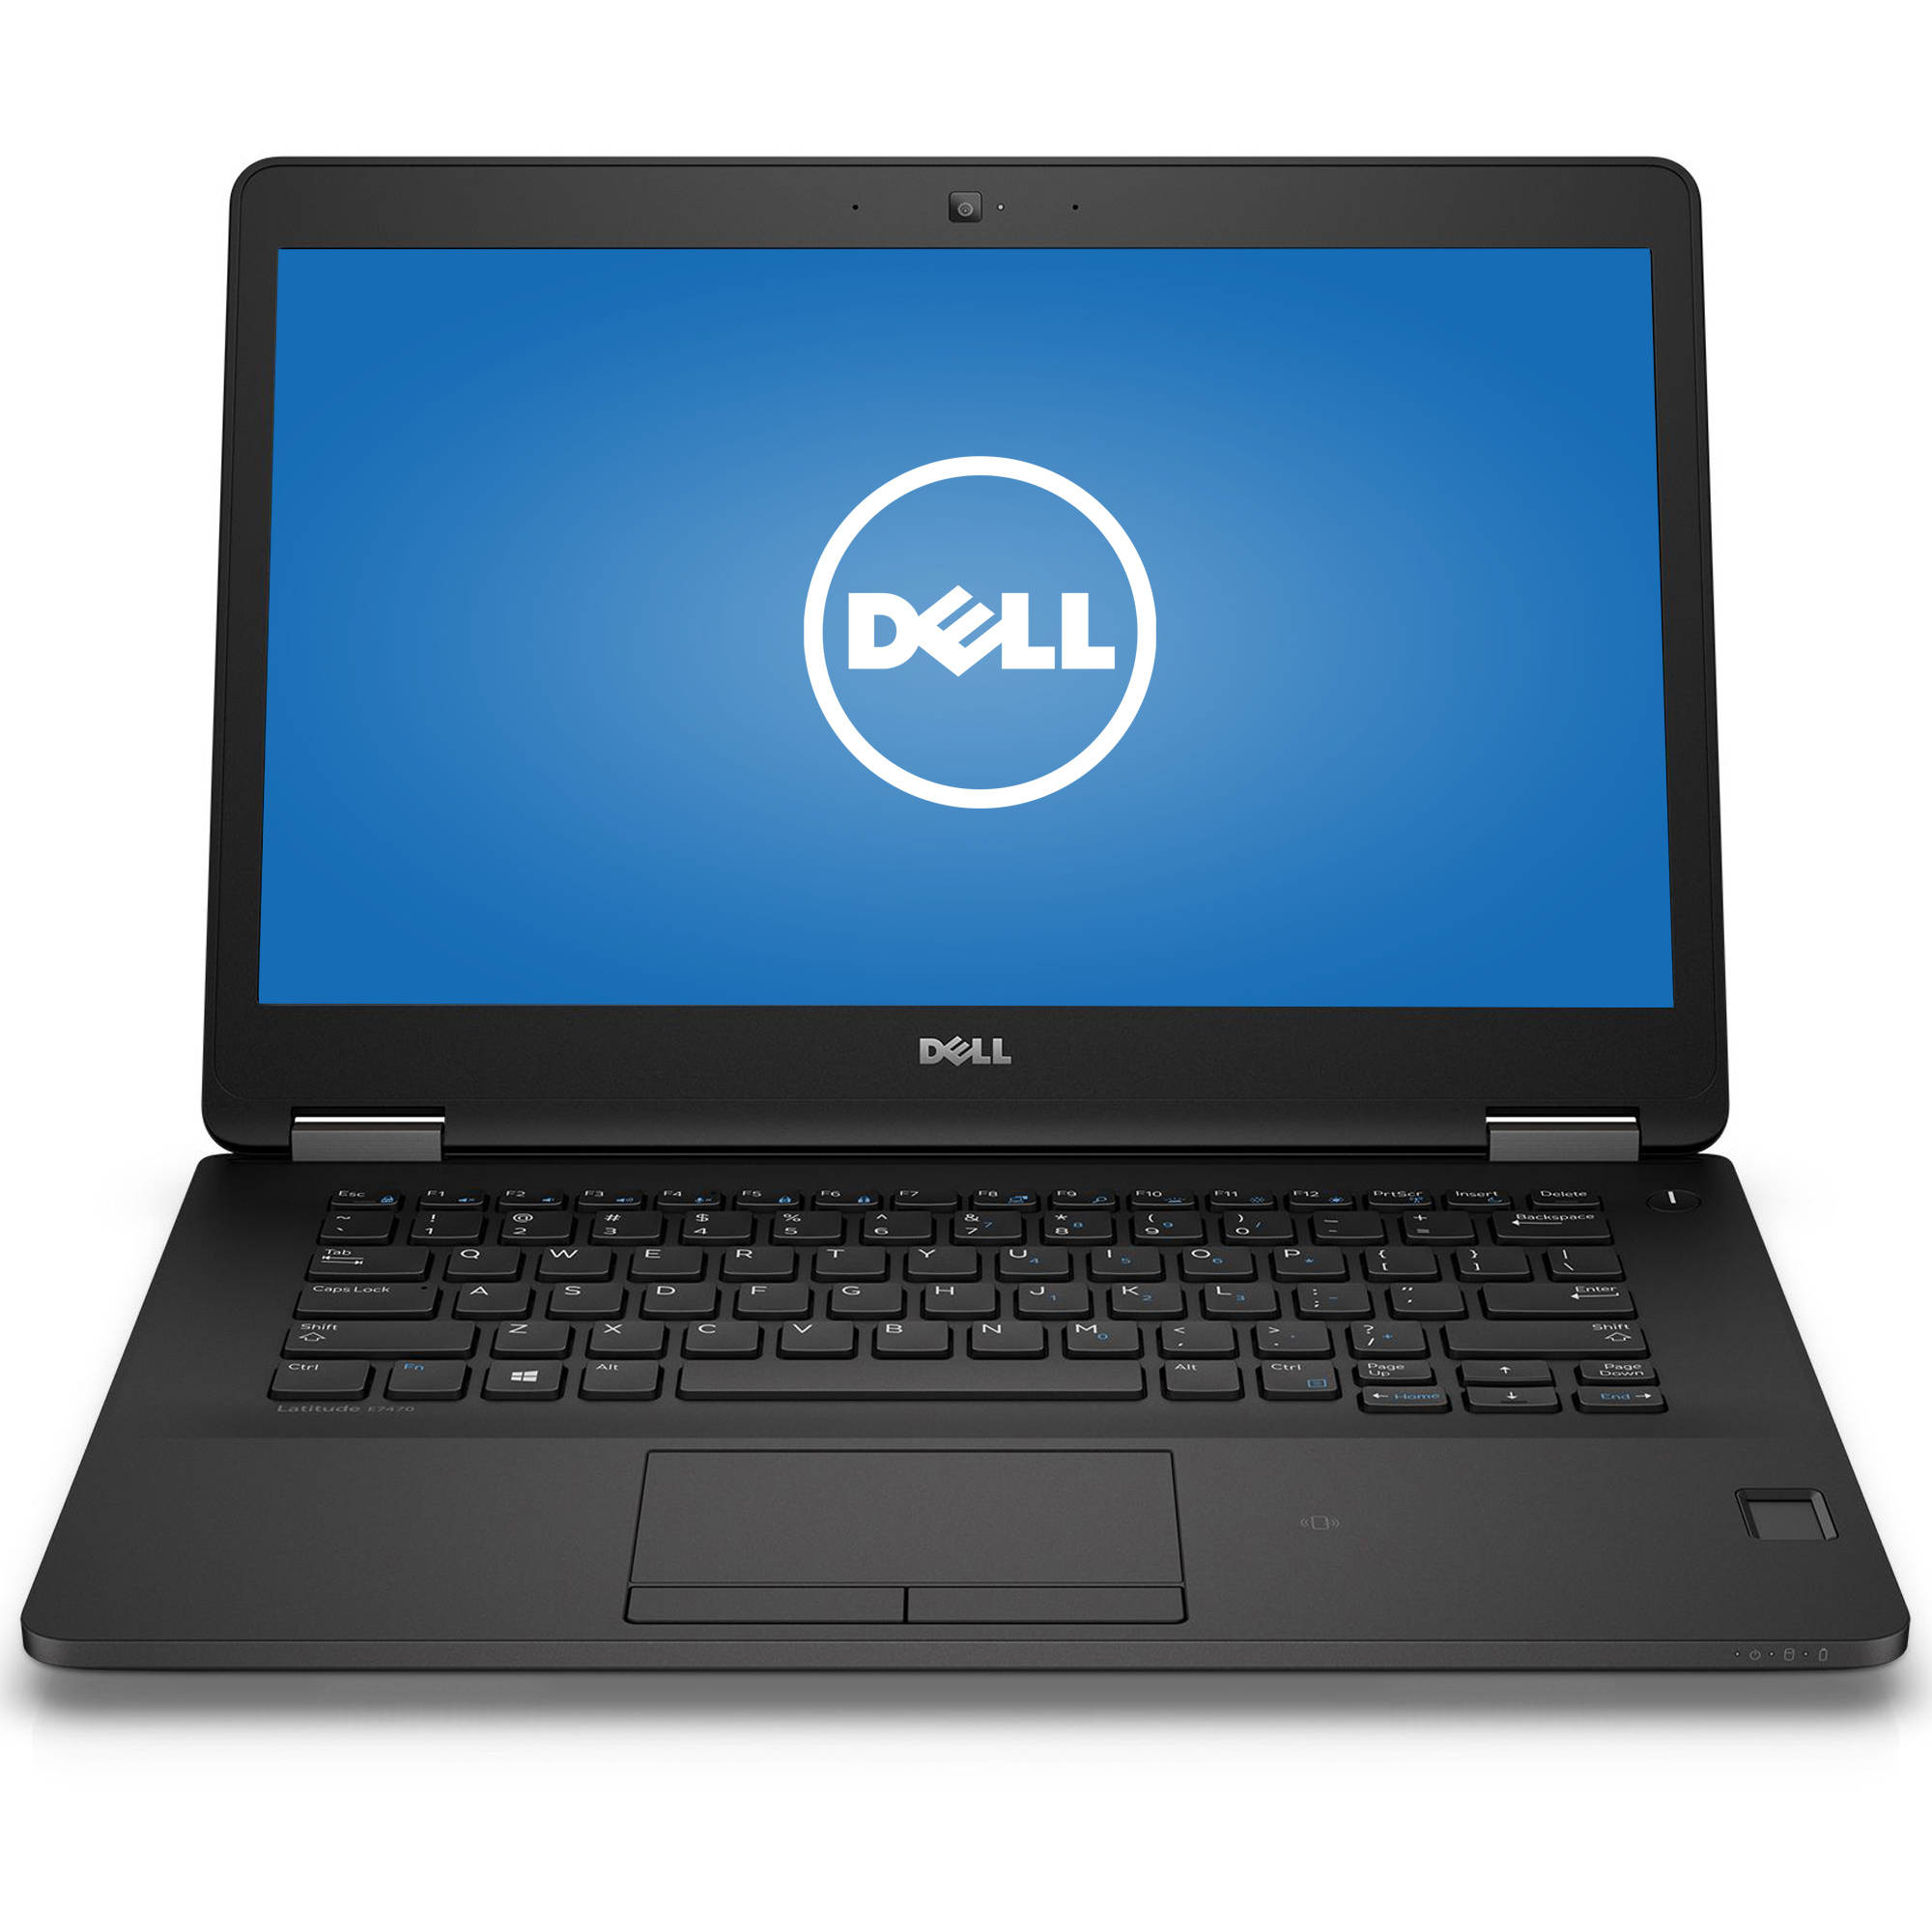 Dell Latitude 14u0022 Laptop, Windows 7 Professional, Intel Core i5-6440HQ Processor, 8GB RAM, 256GB Solid State Drive